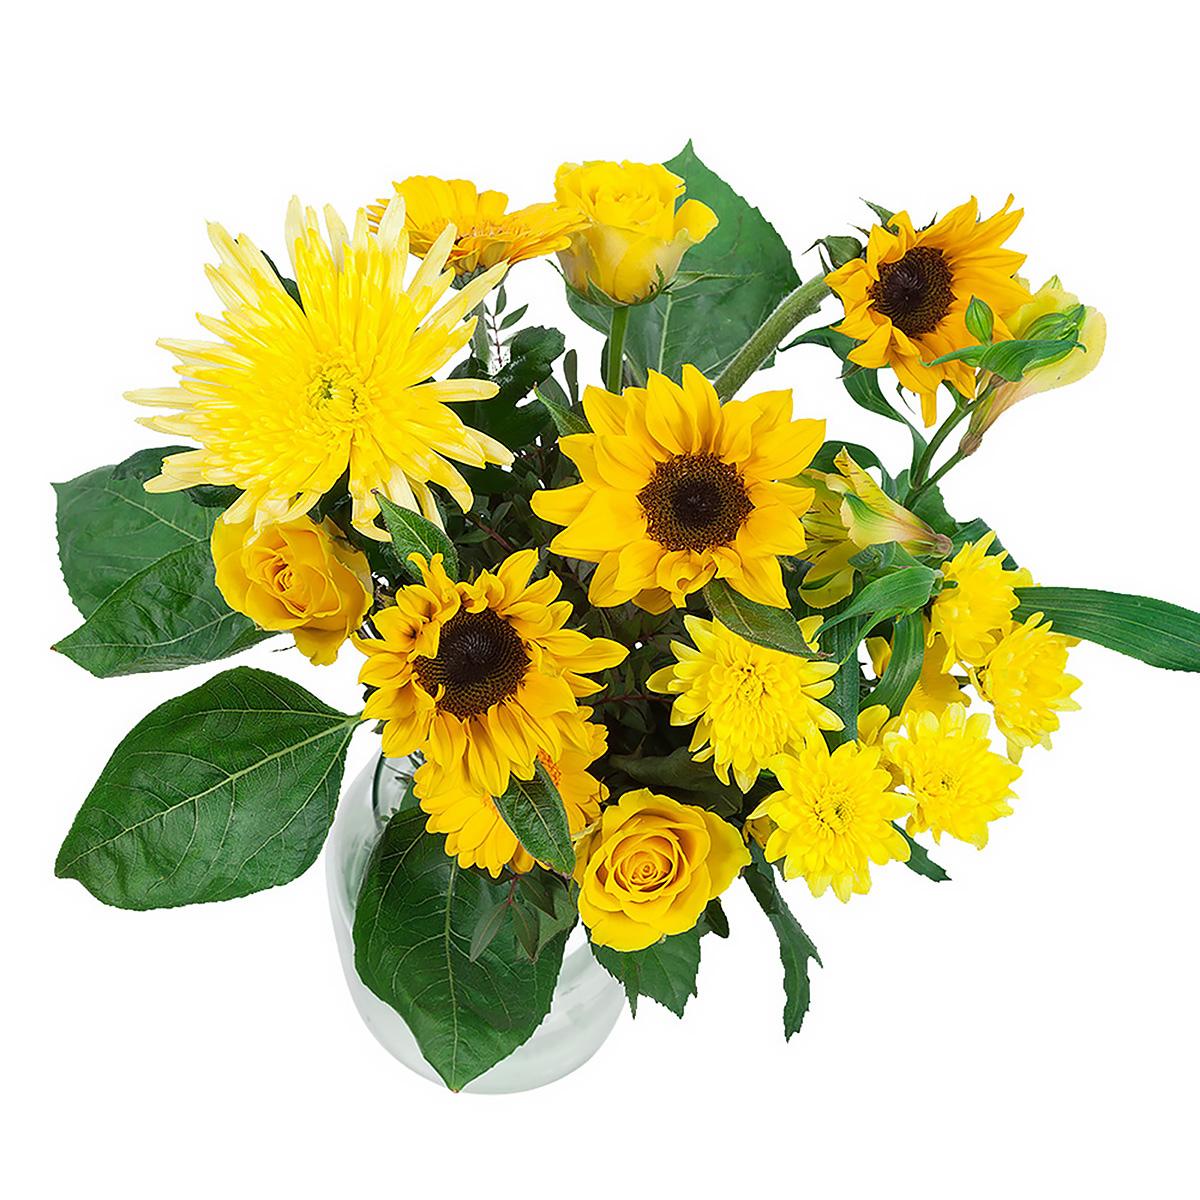 Bloemen 60cm: Sunny